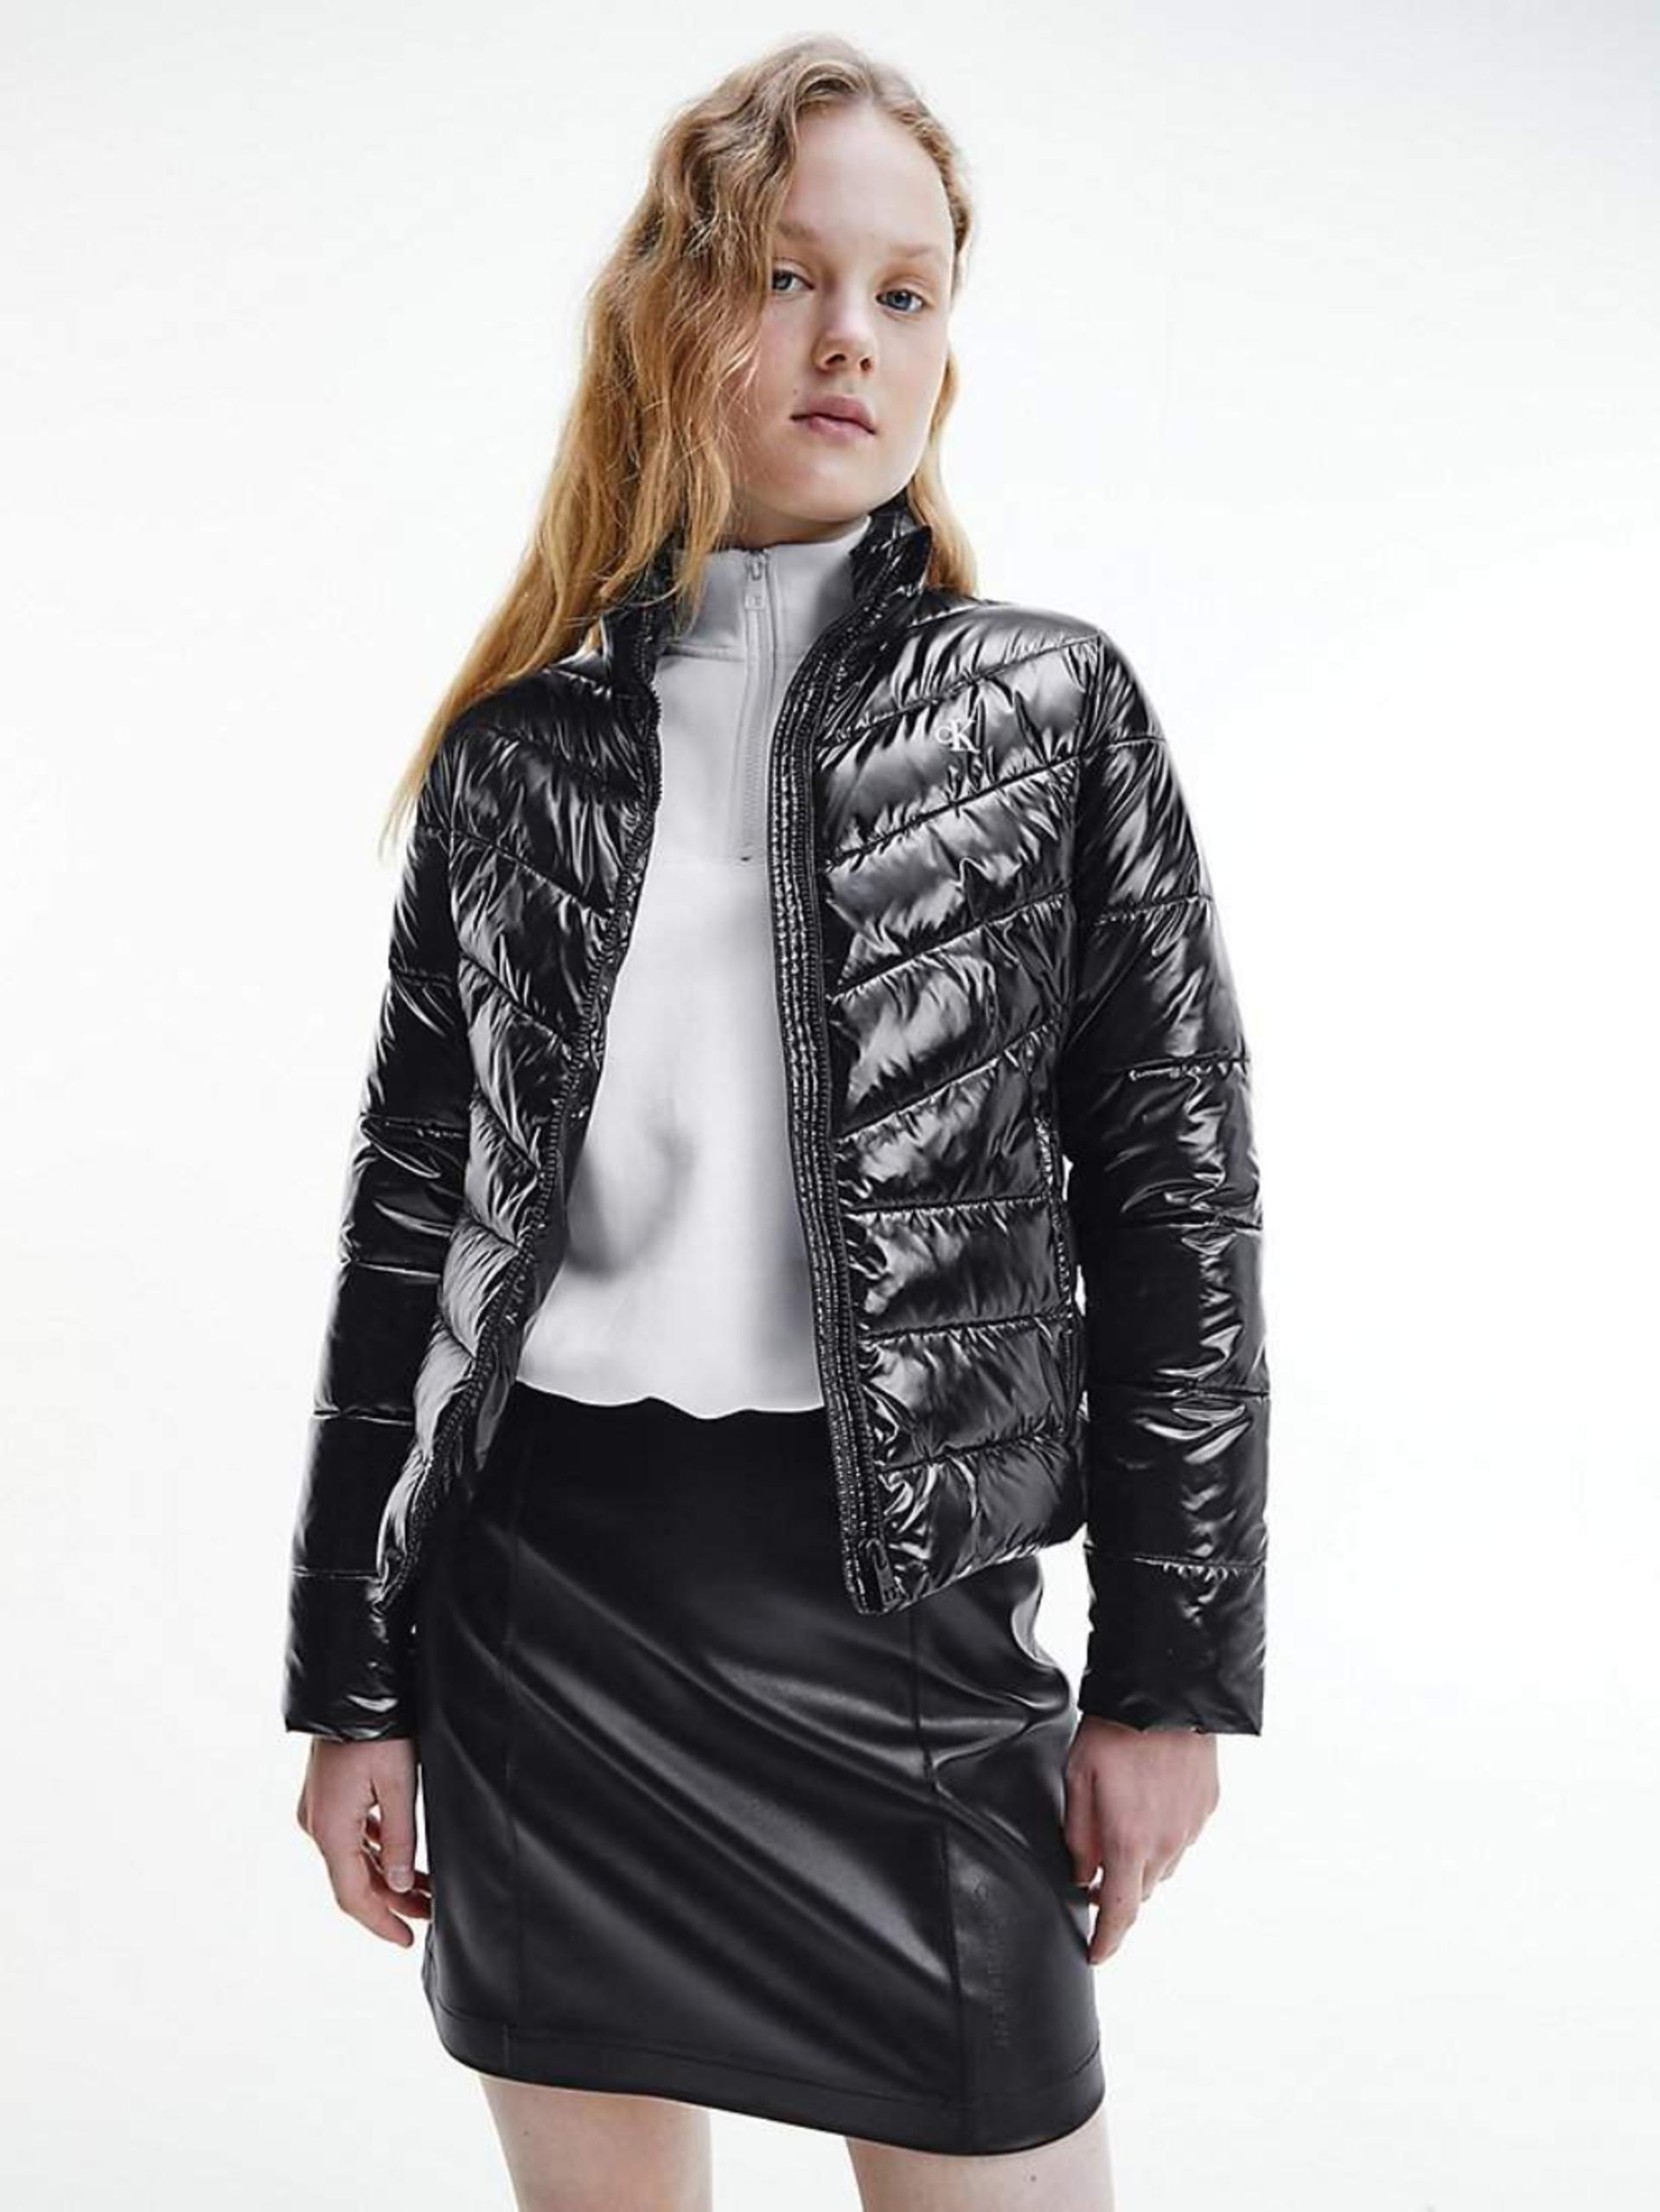 Calvin Klein dámská černá lesklá bunda